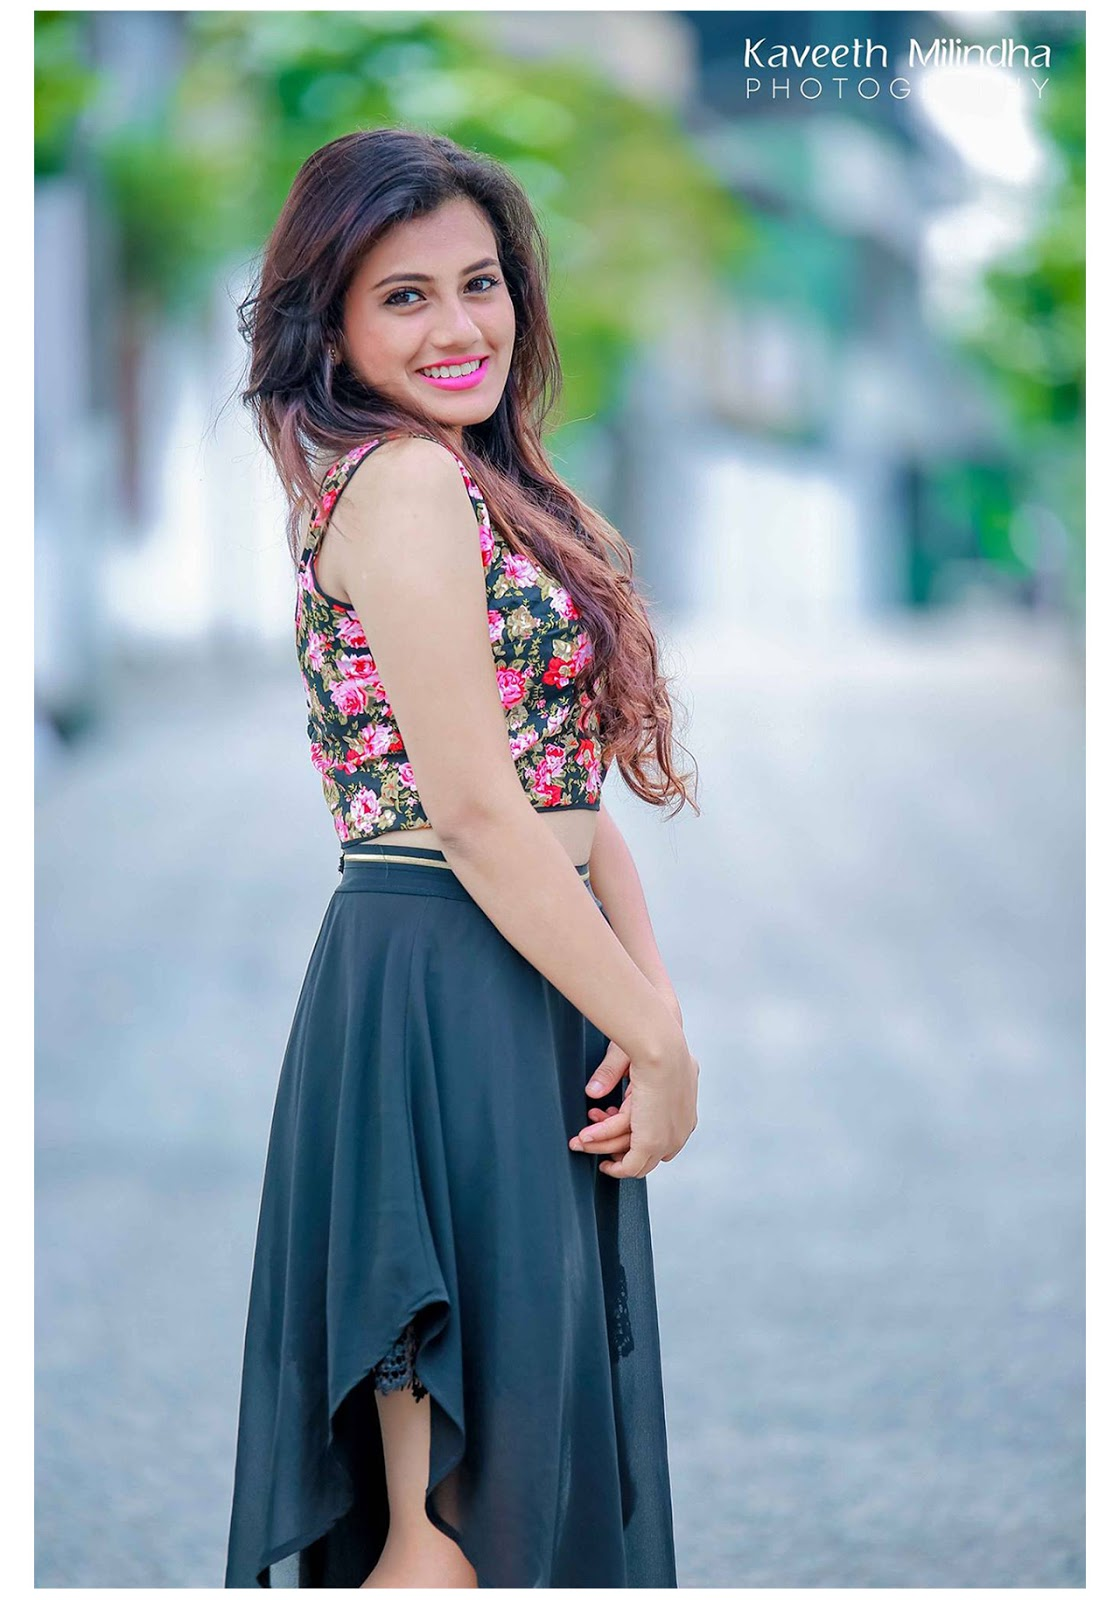 Actress & Models: Shanudrie Priyasad - Sri Lankan